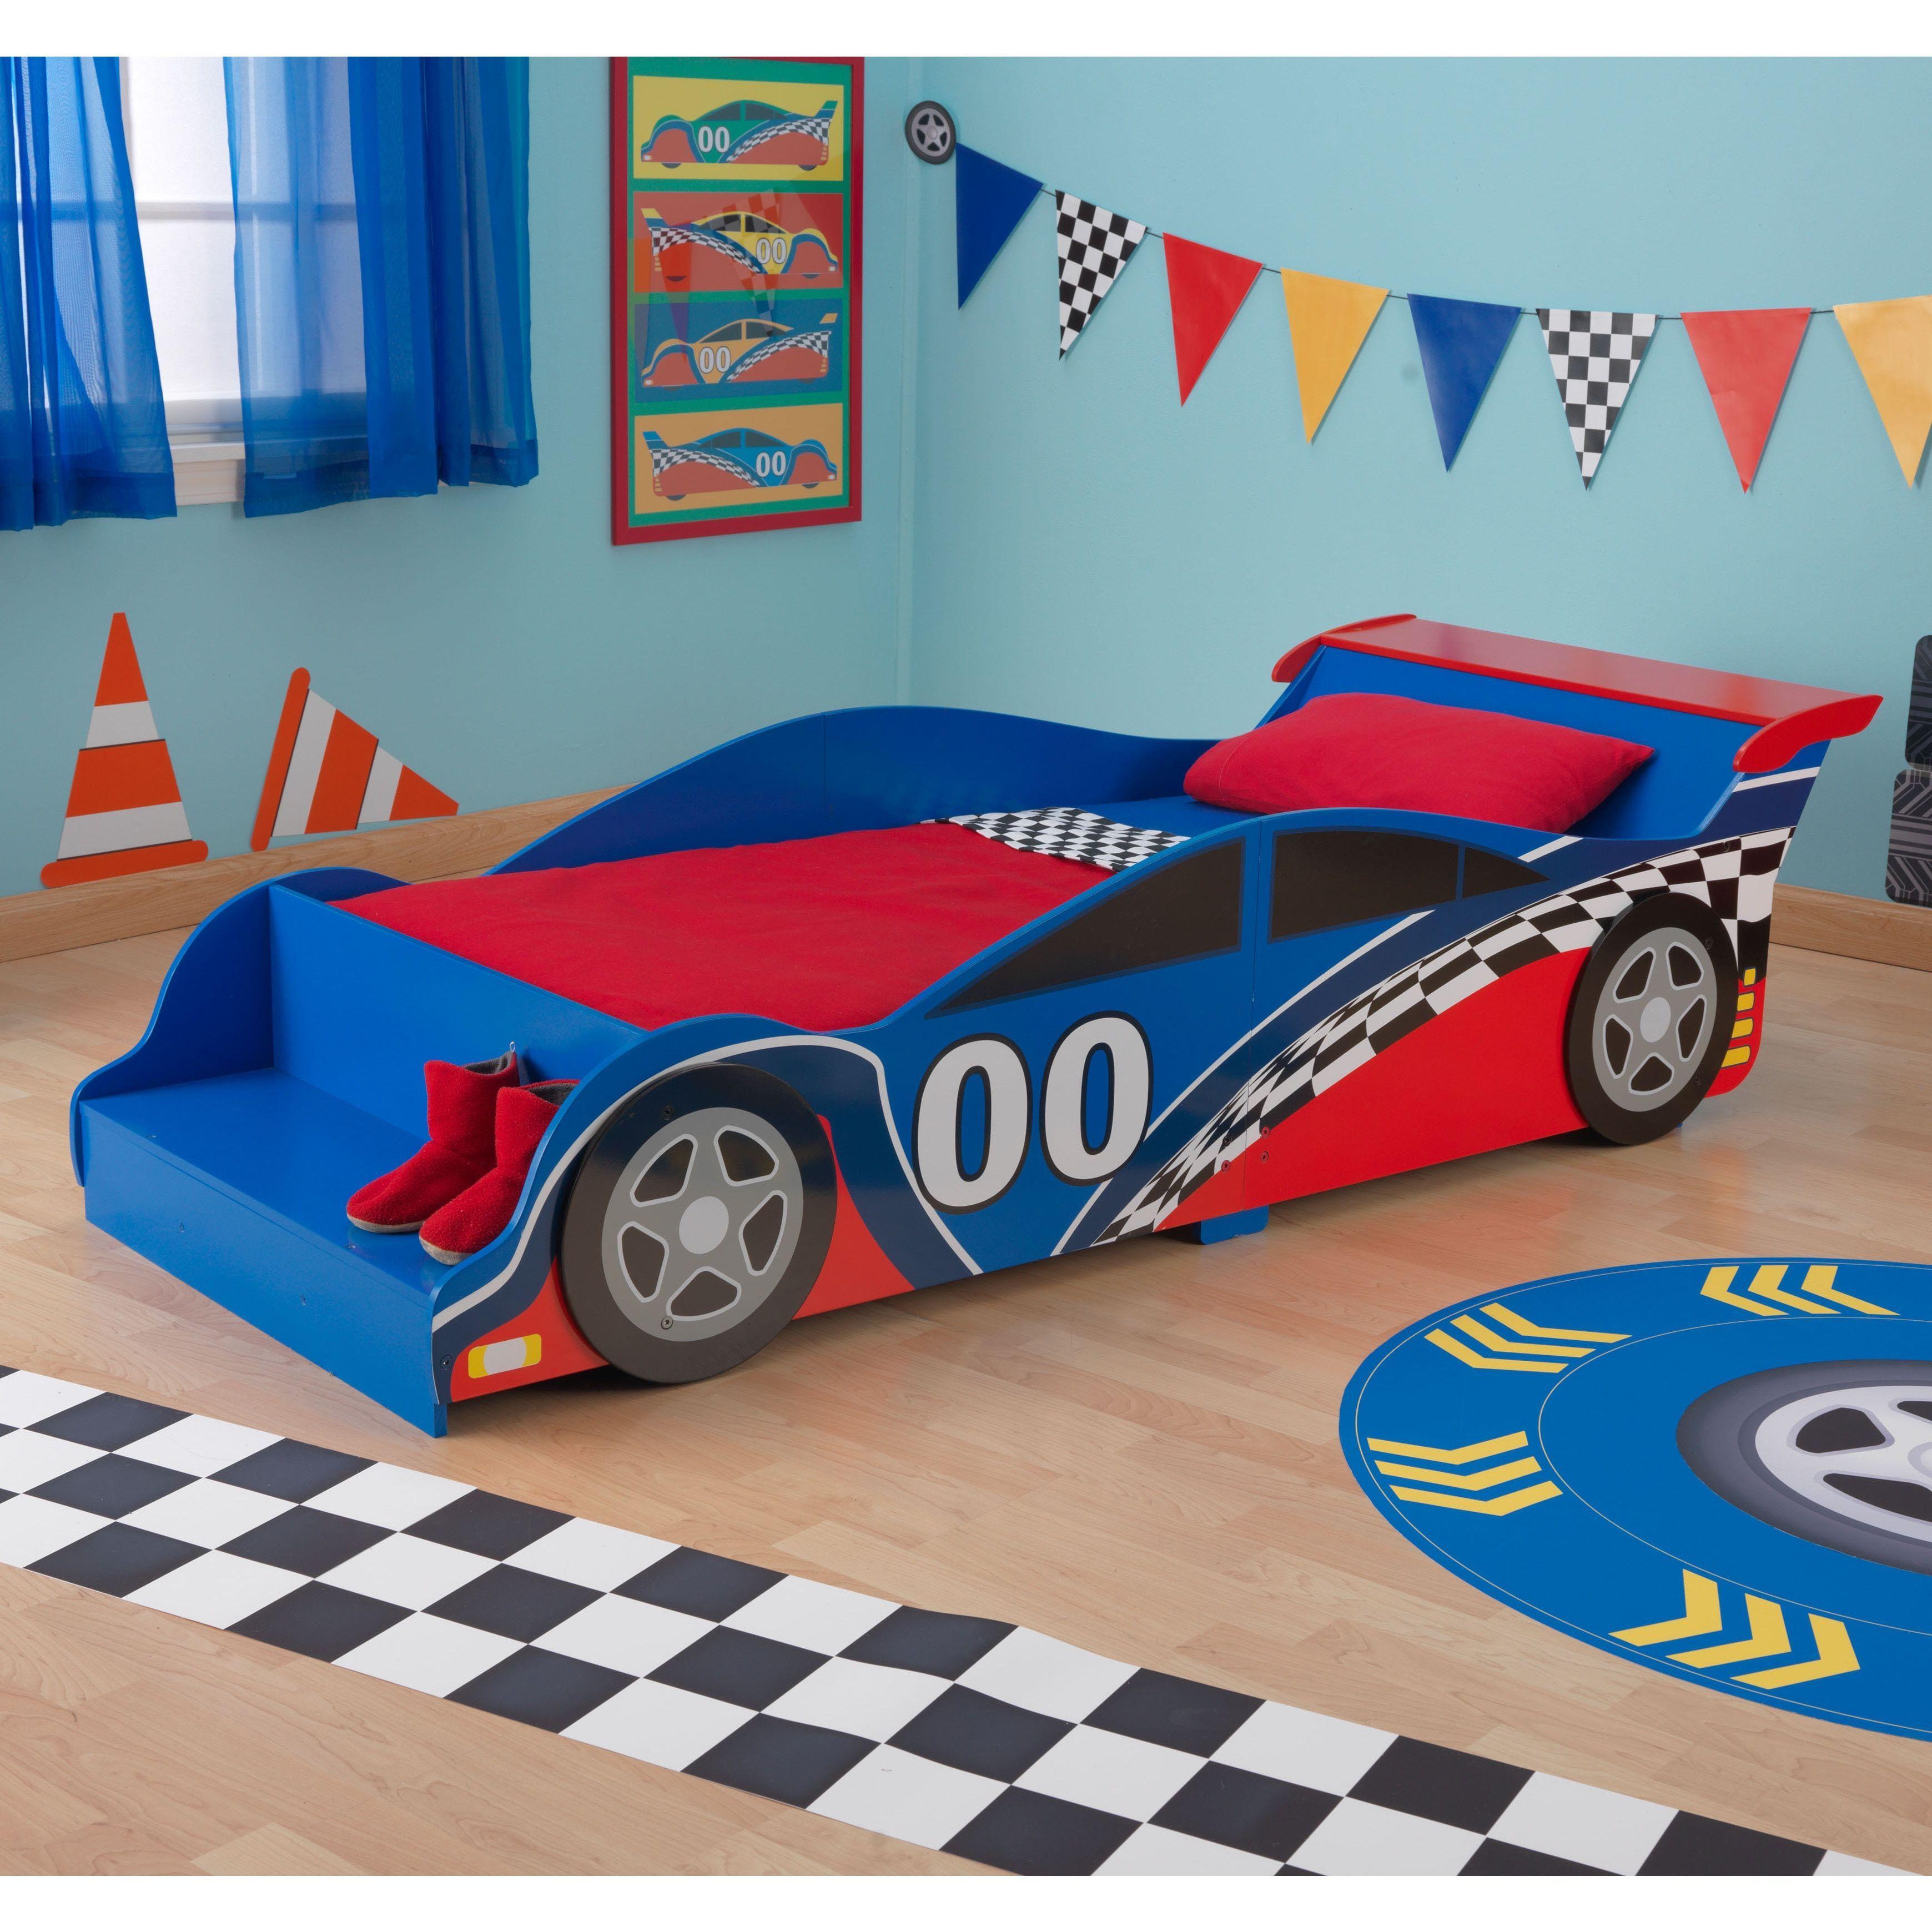 KidKraft Race Car Toddler Bed (Racecar Toddler Bed), Red